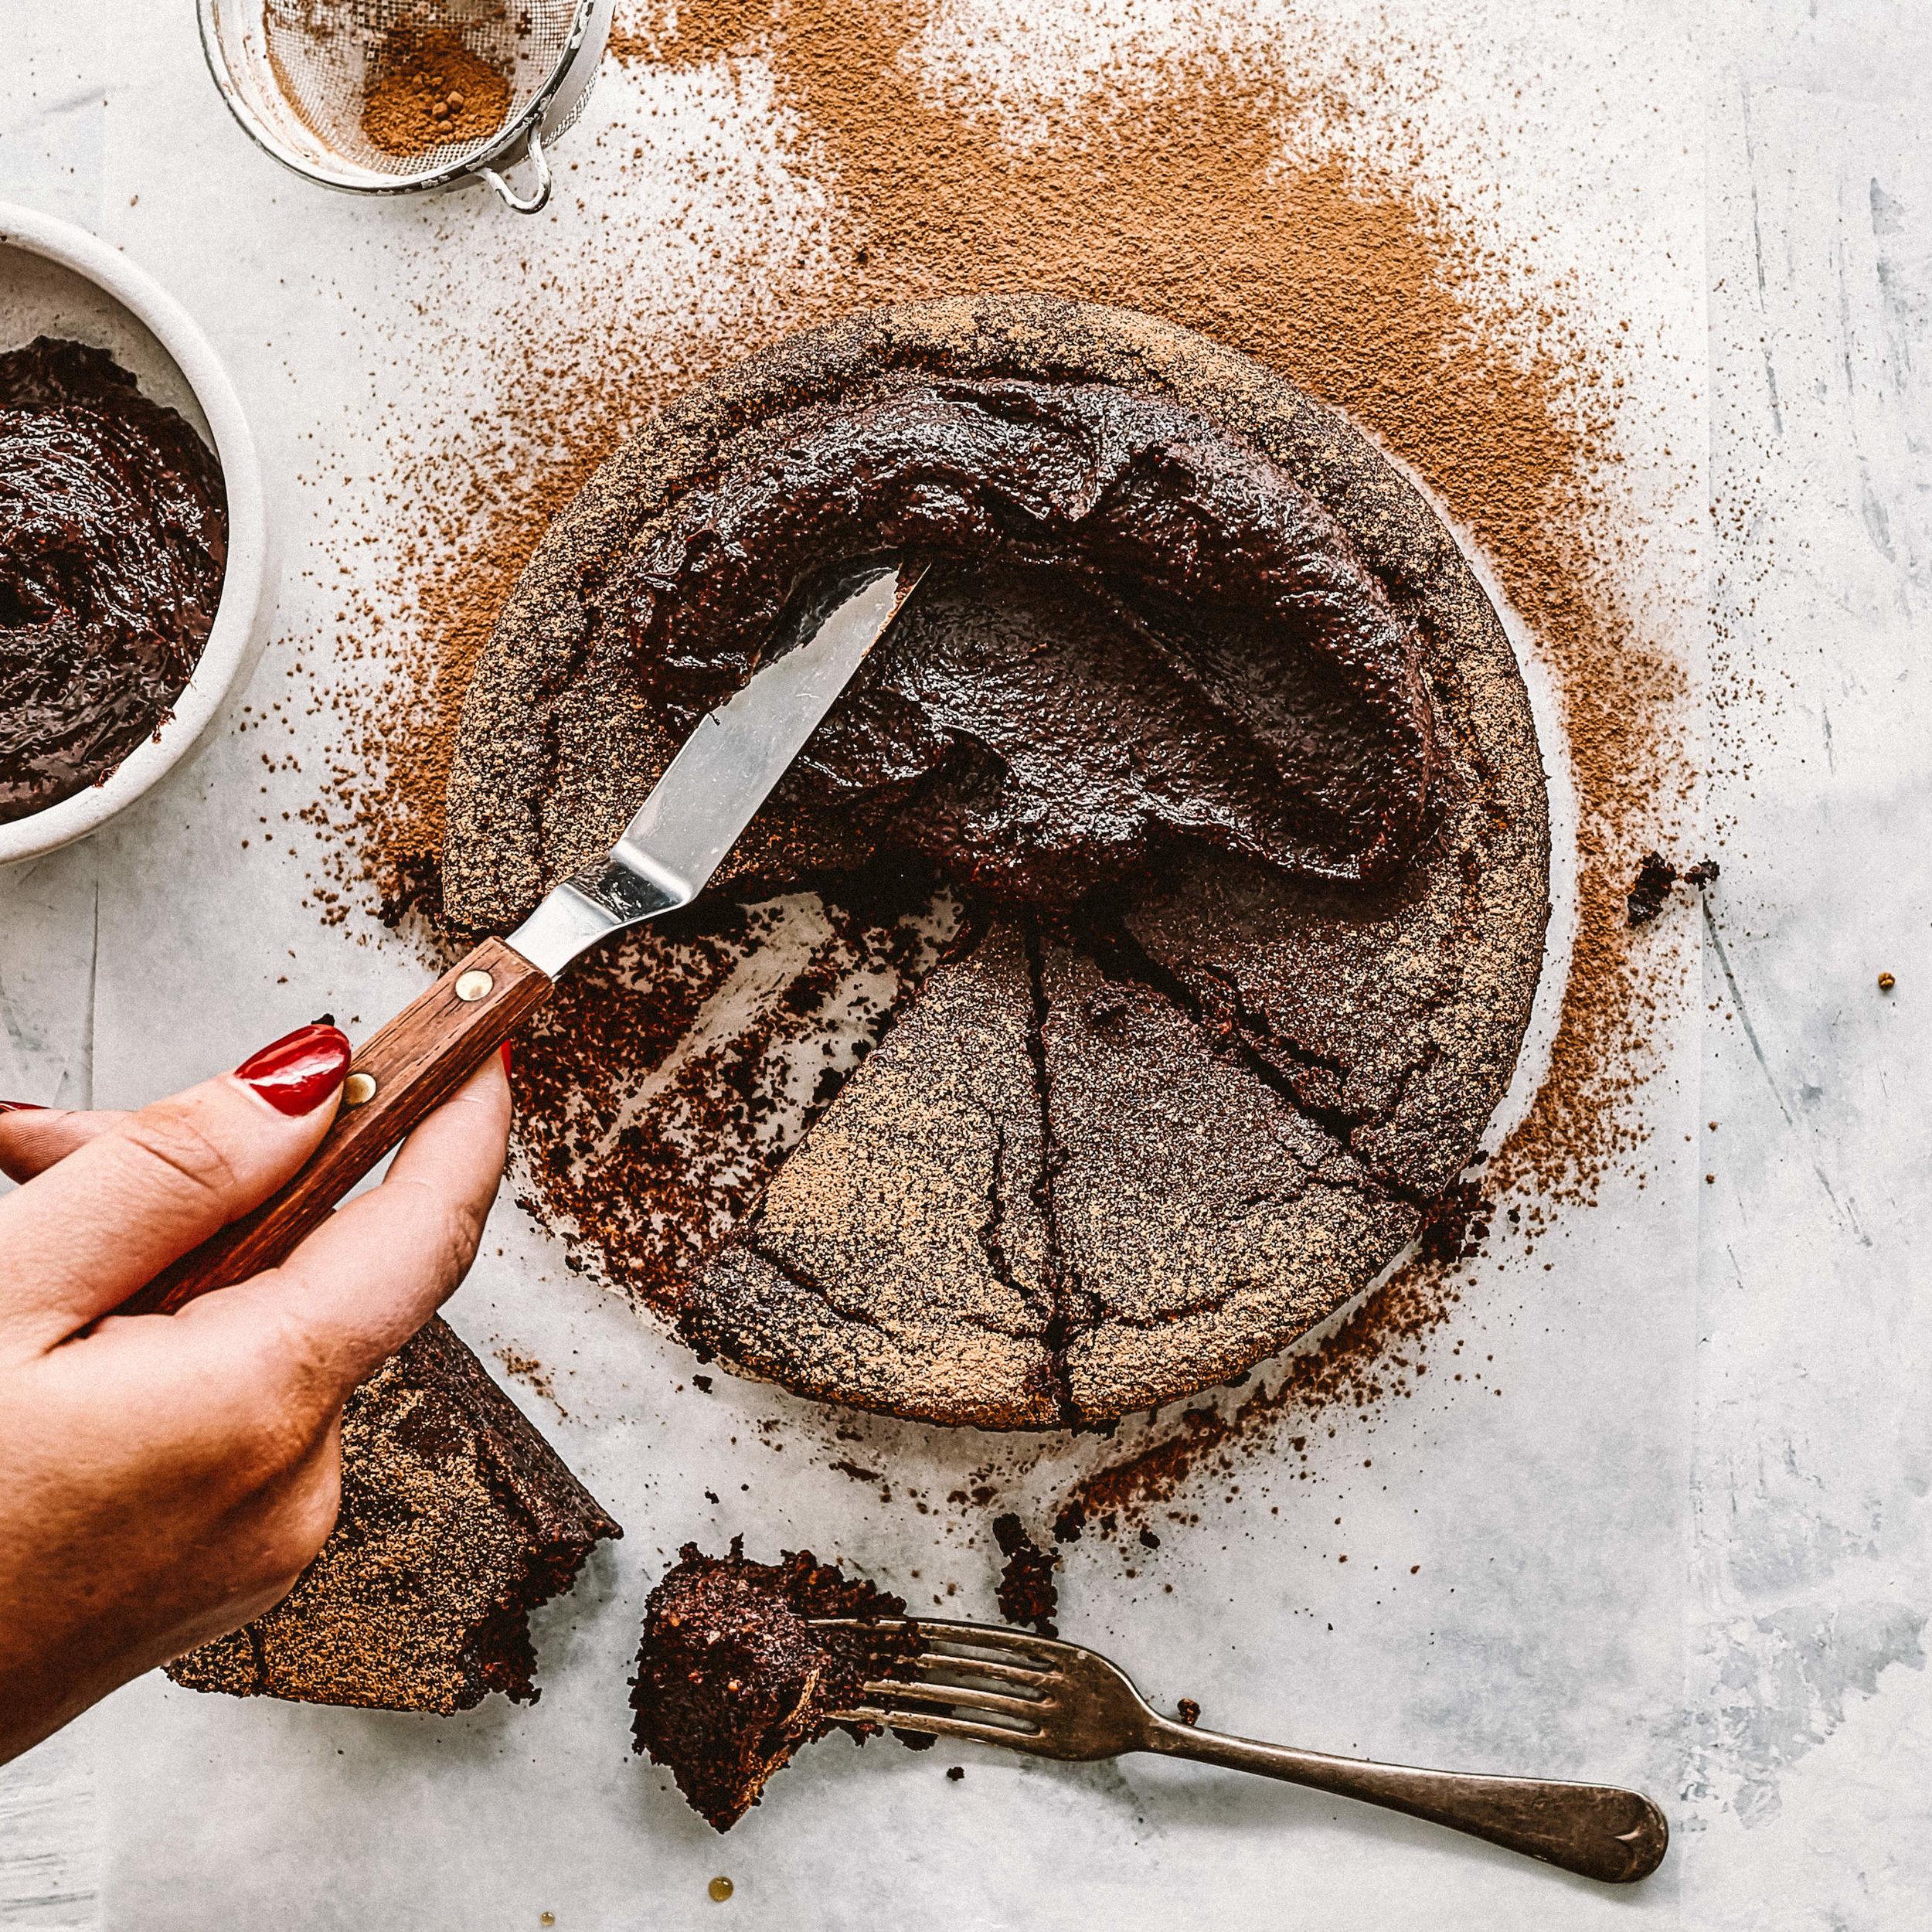 mothers day chocolate cake 2.jpg